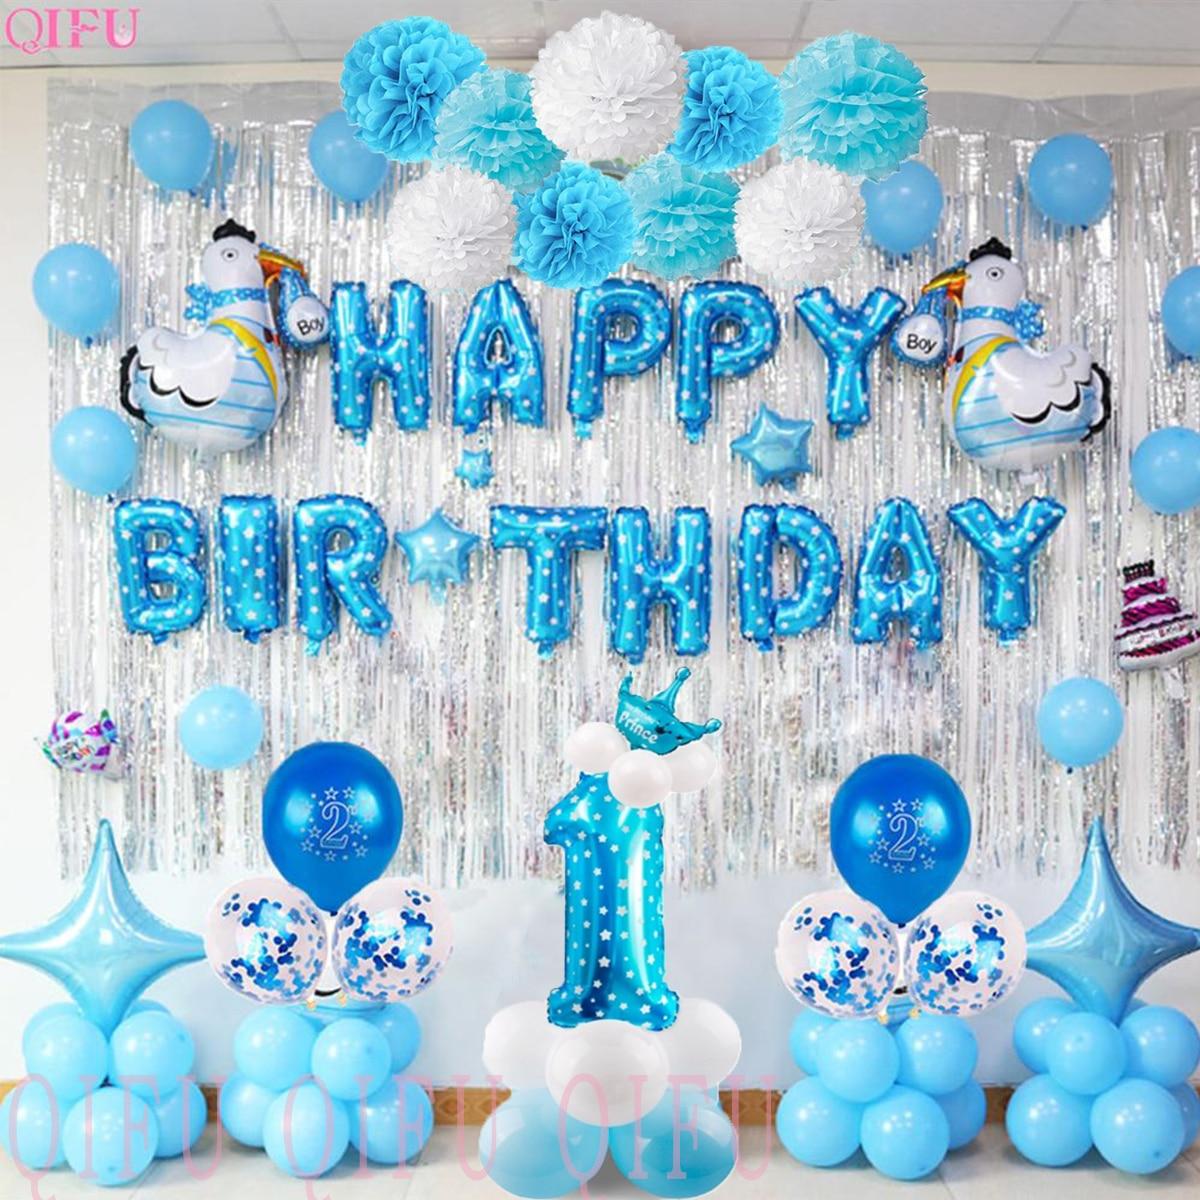 QIFU 1 Birthday Boy 1st Birthday Party Decorations Kids My ...